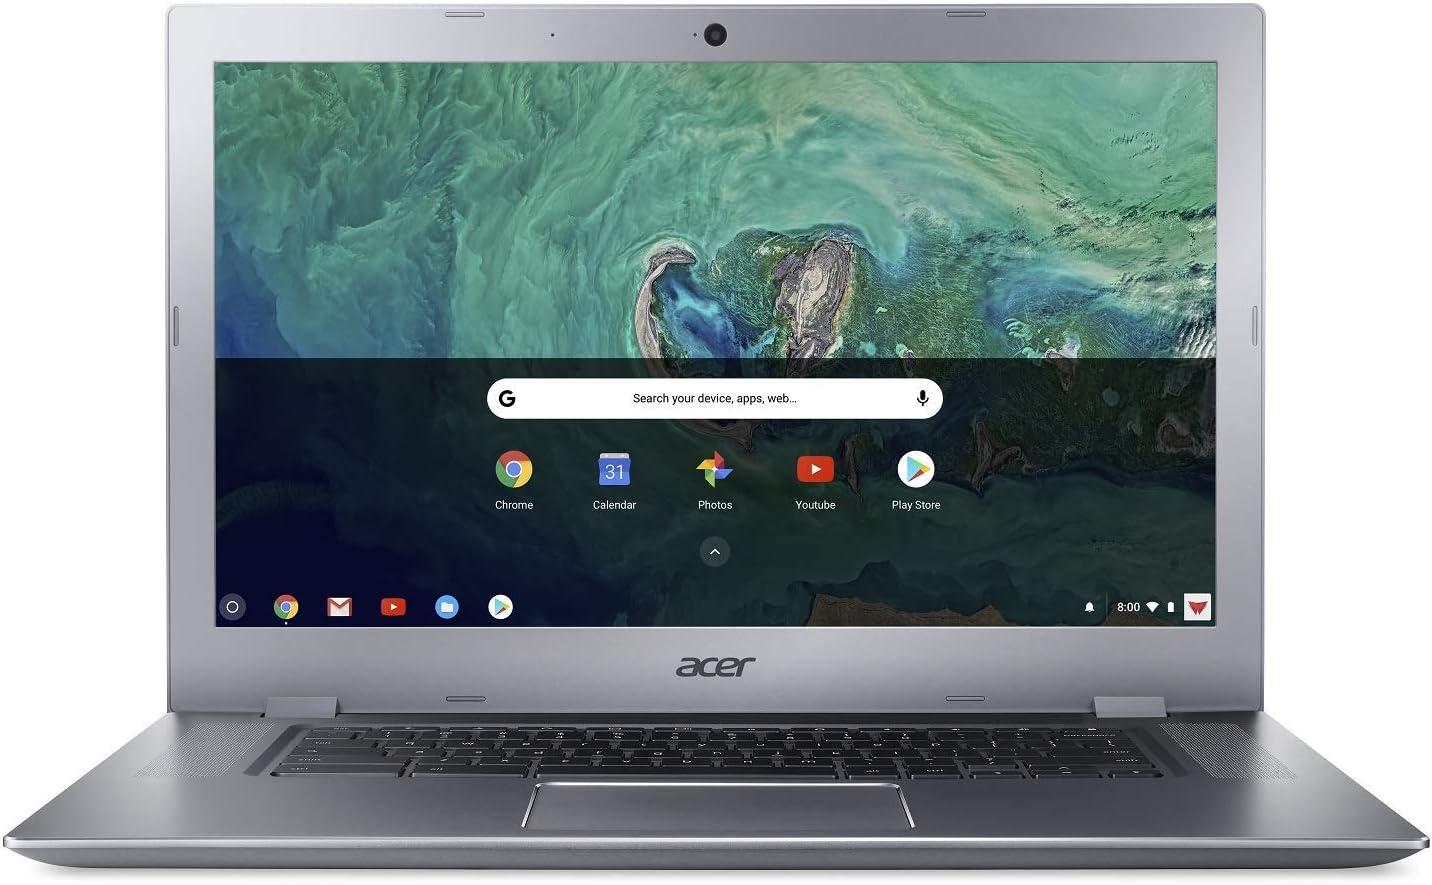 "Acer Chromebook 15 CB315-1HT-C4RY, Intel Celeron N3350, 15.6"" Full HD Touch Display, 4GB LPDDR4, 32GB eMMC, 802.11ac WiFi, Bluetooth 4.2, Google Chrome (Renewed)"